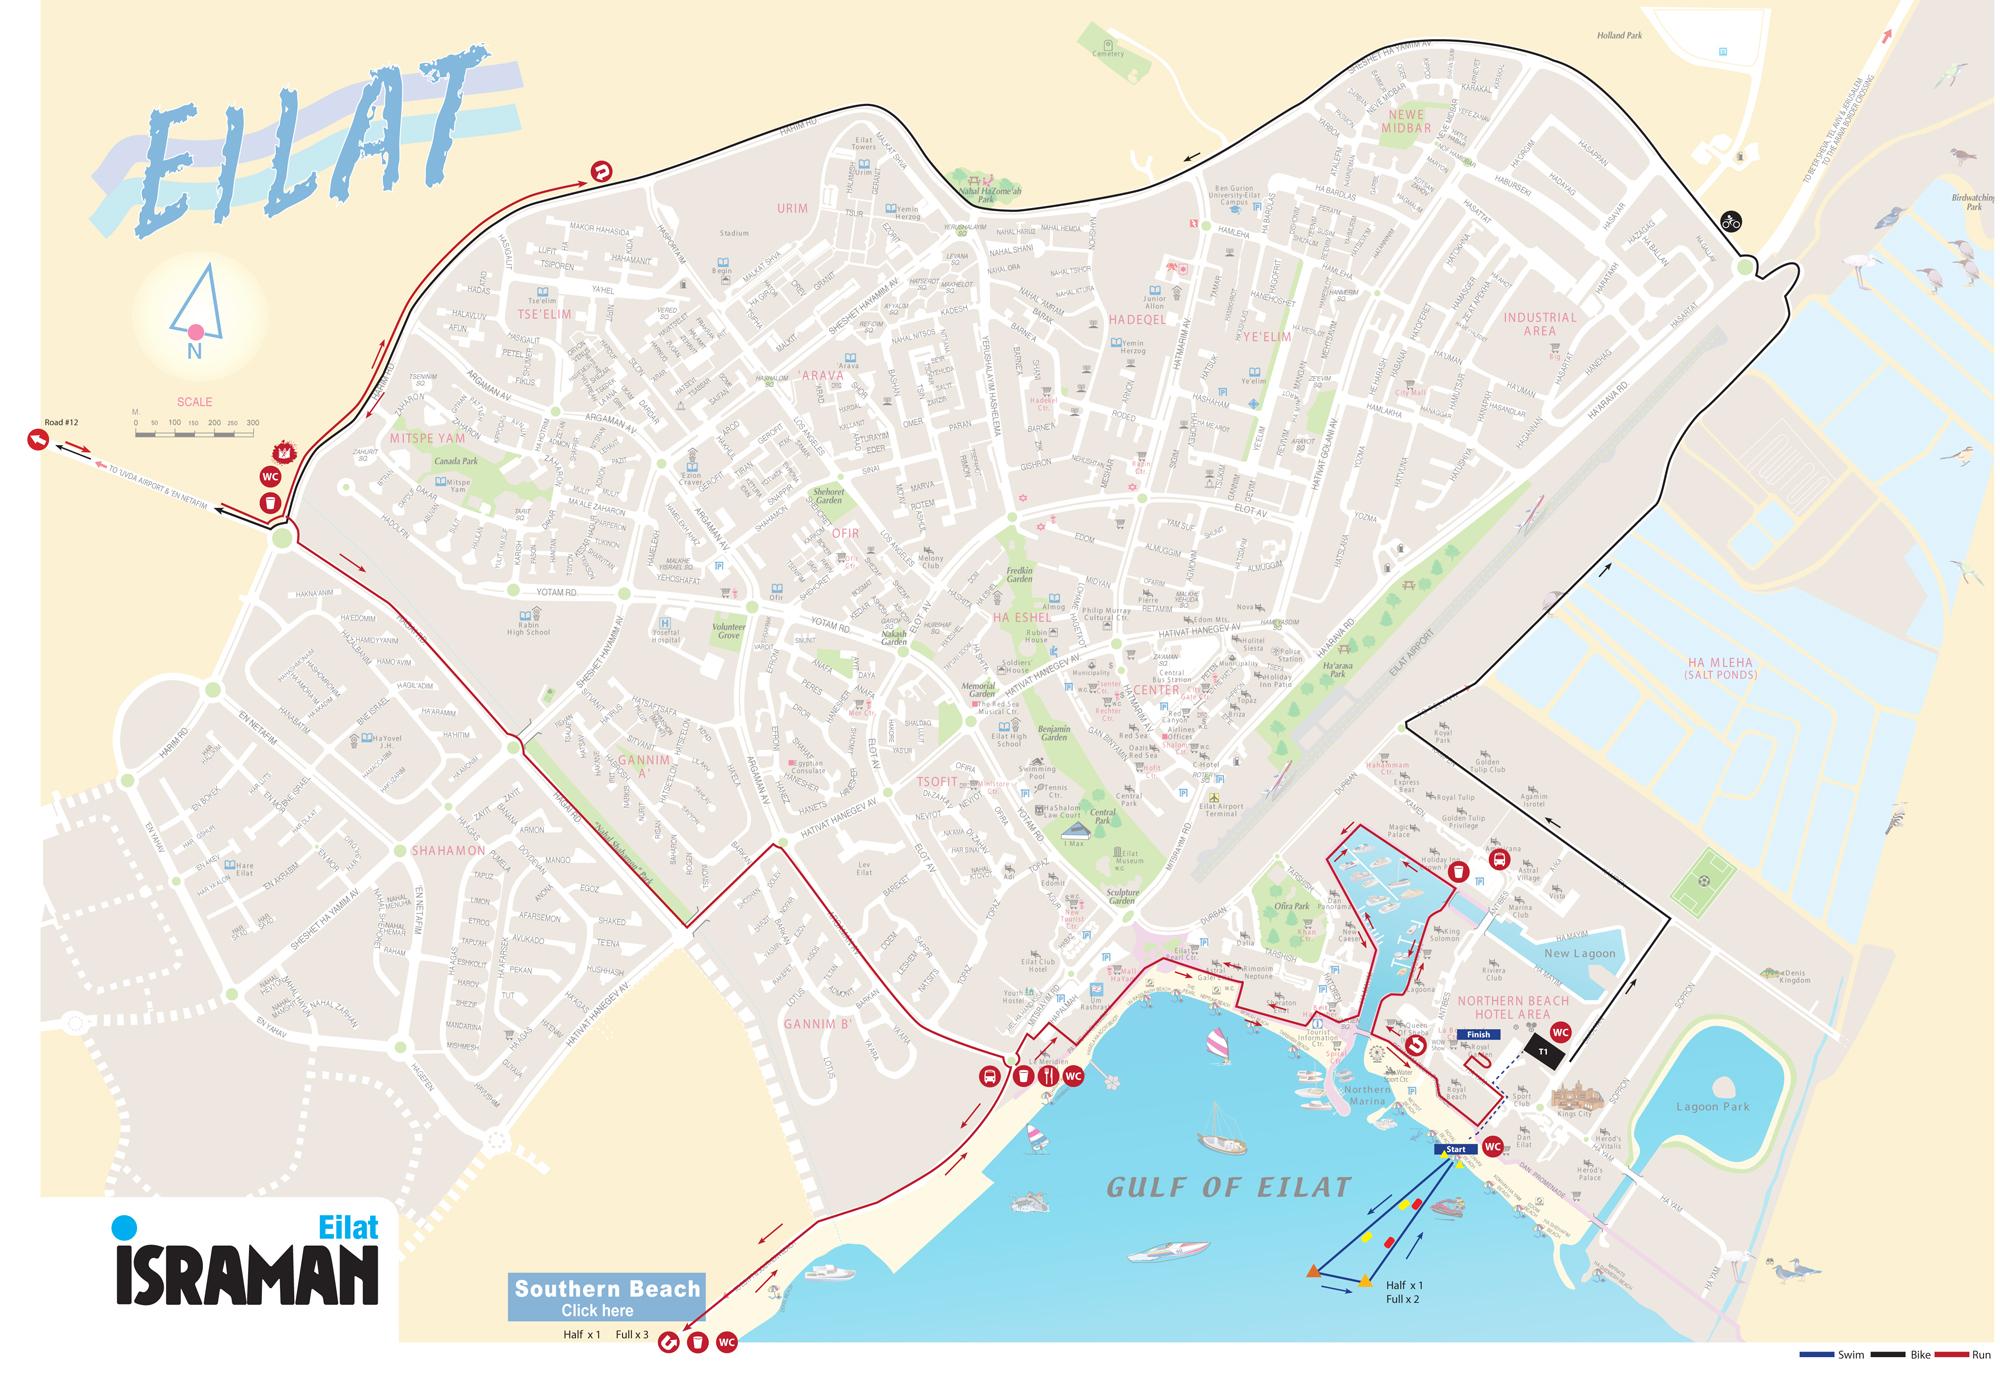 Course ISRAMAN Eilat